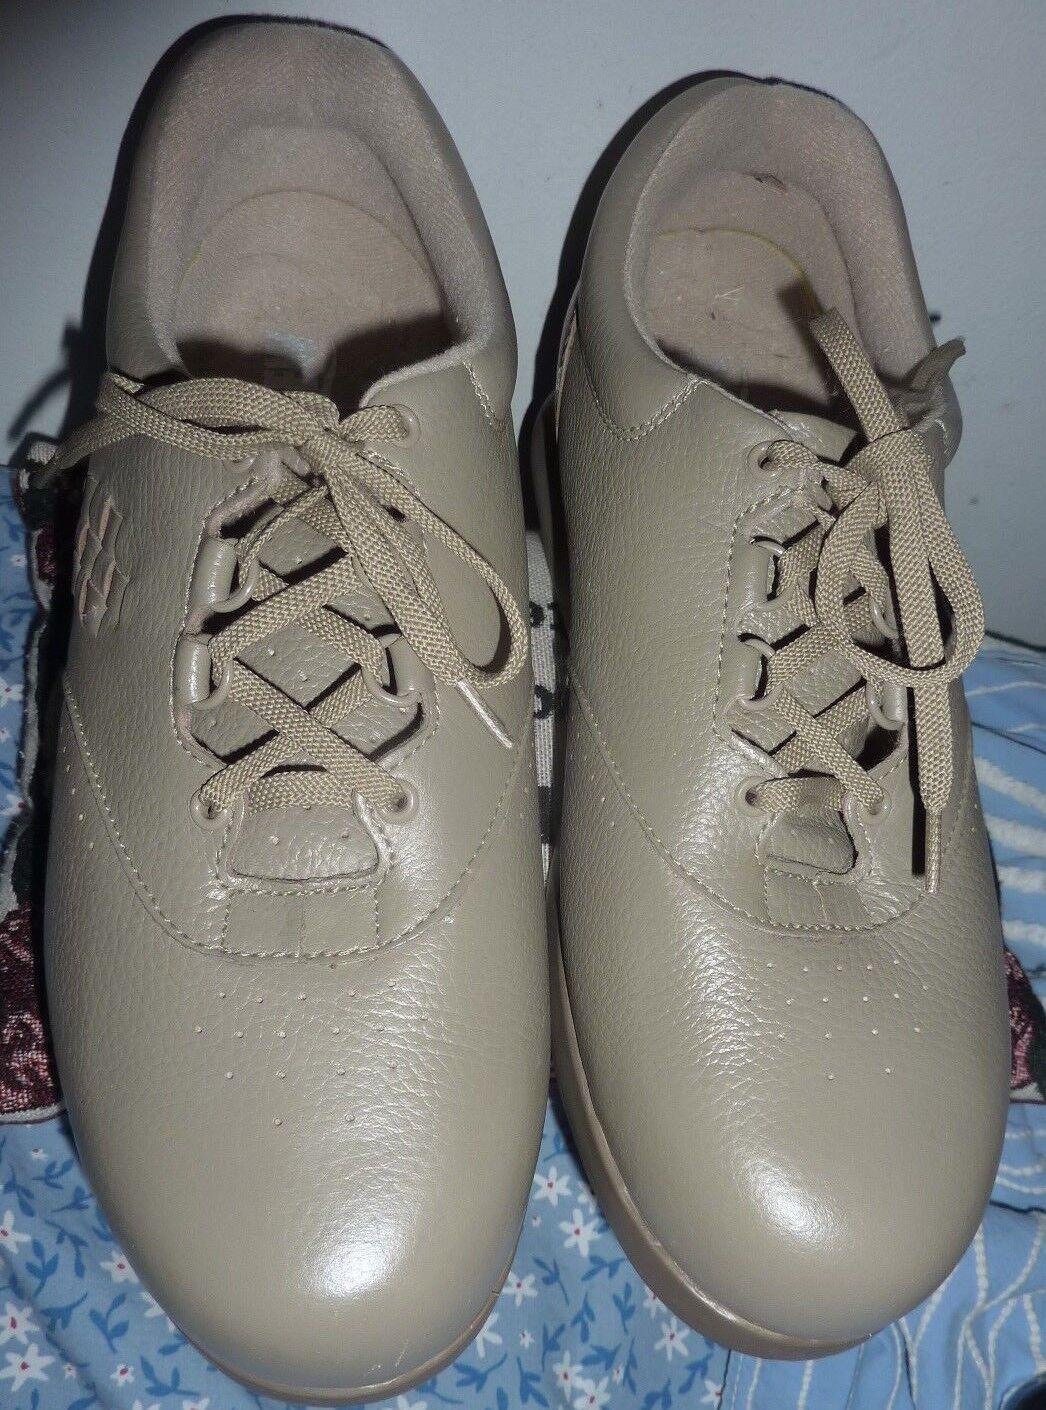 Damens's DREW Orthopedic W tan Leder Schuhes 8.5 W Orthopedic excellent 9141ed